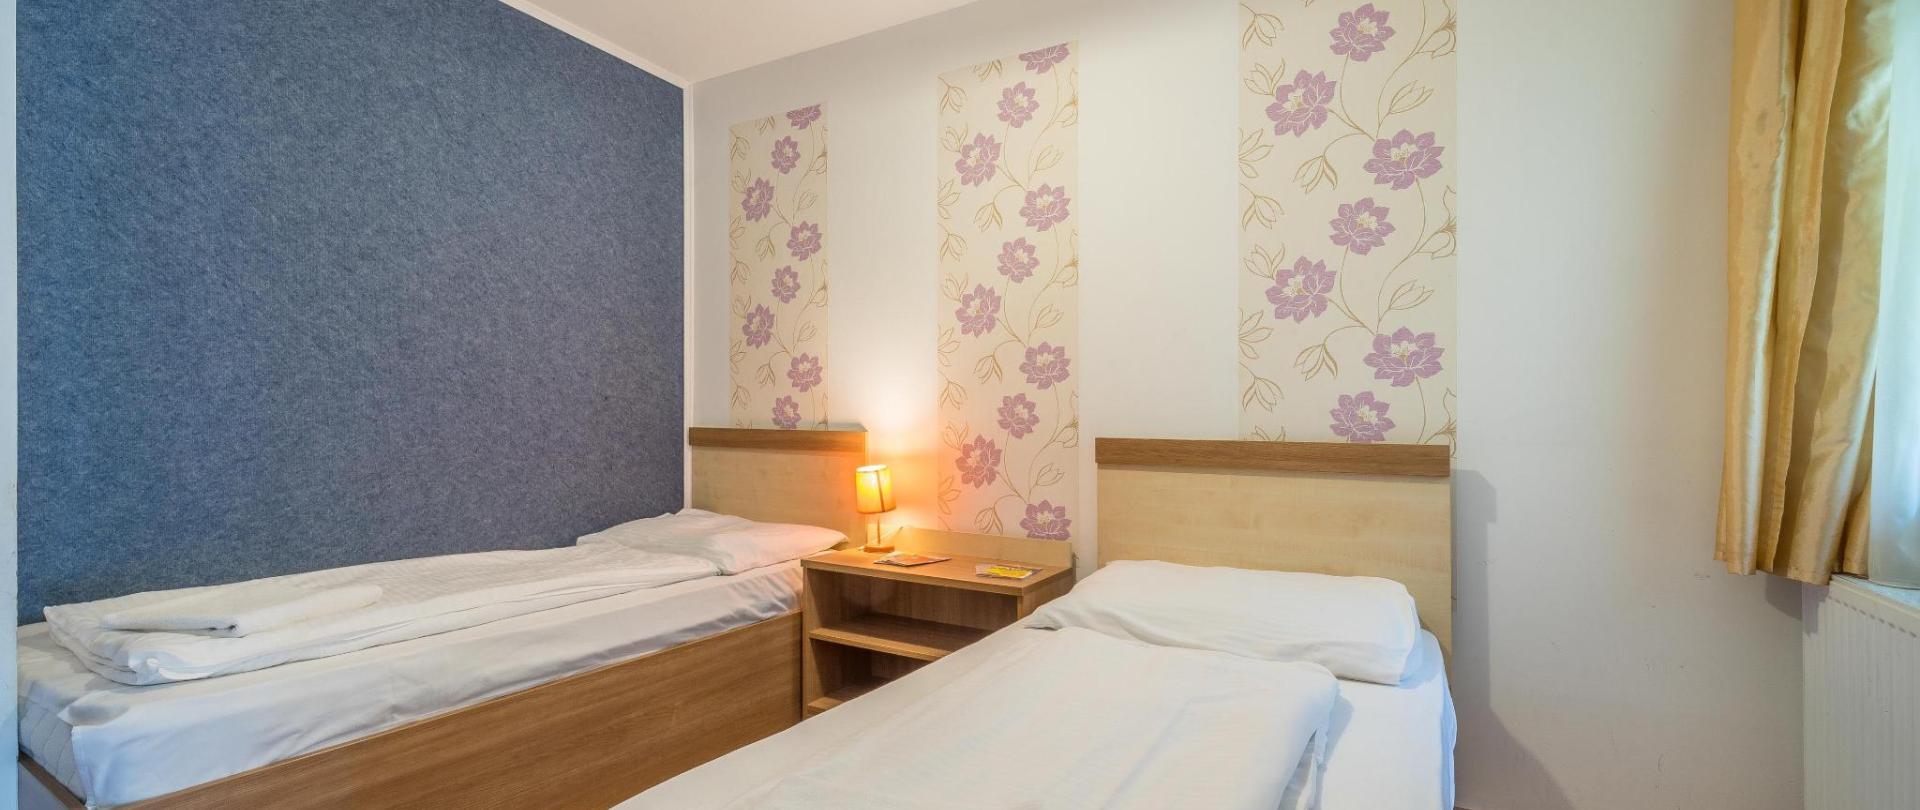 Silver_Hotel (2 of 49).jpg